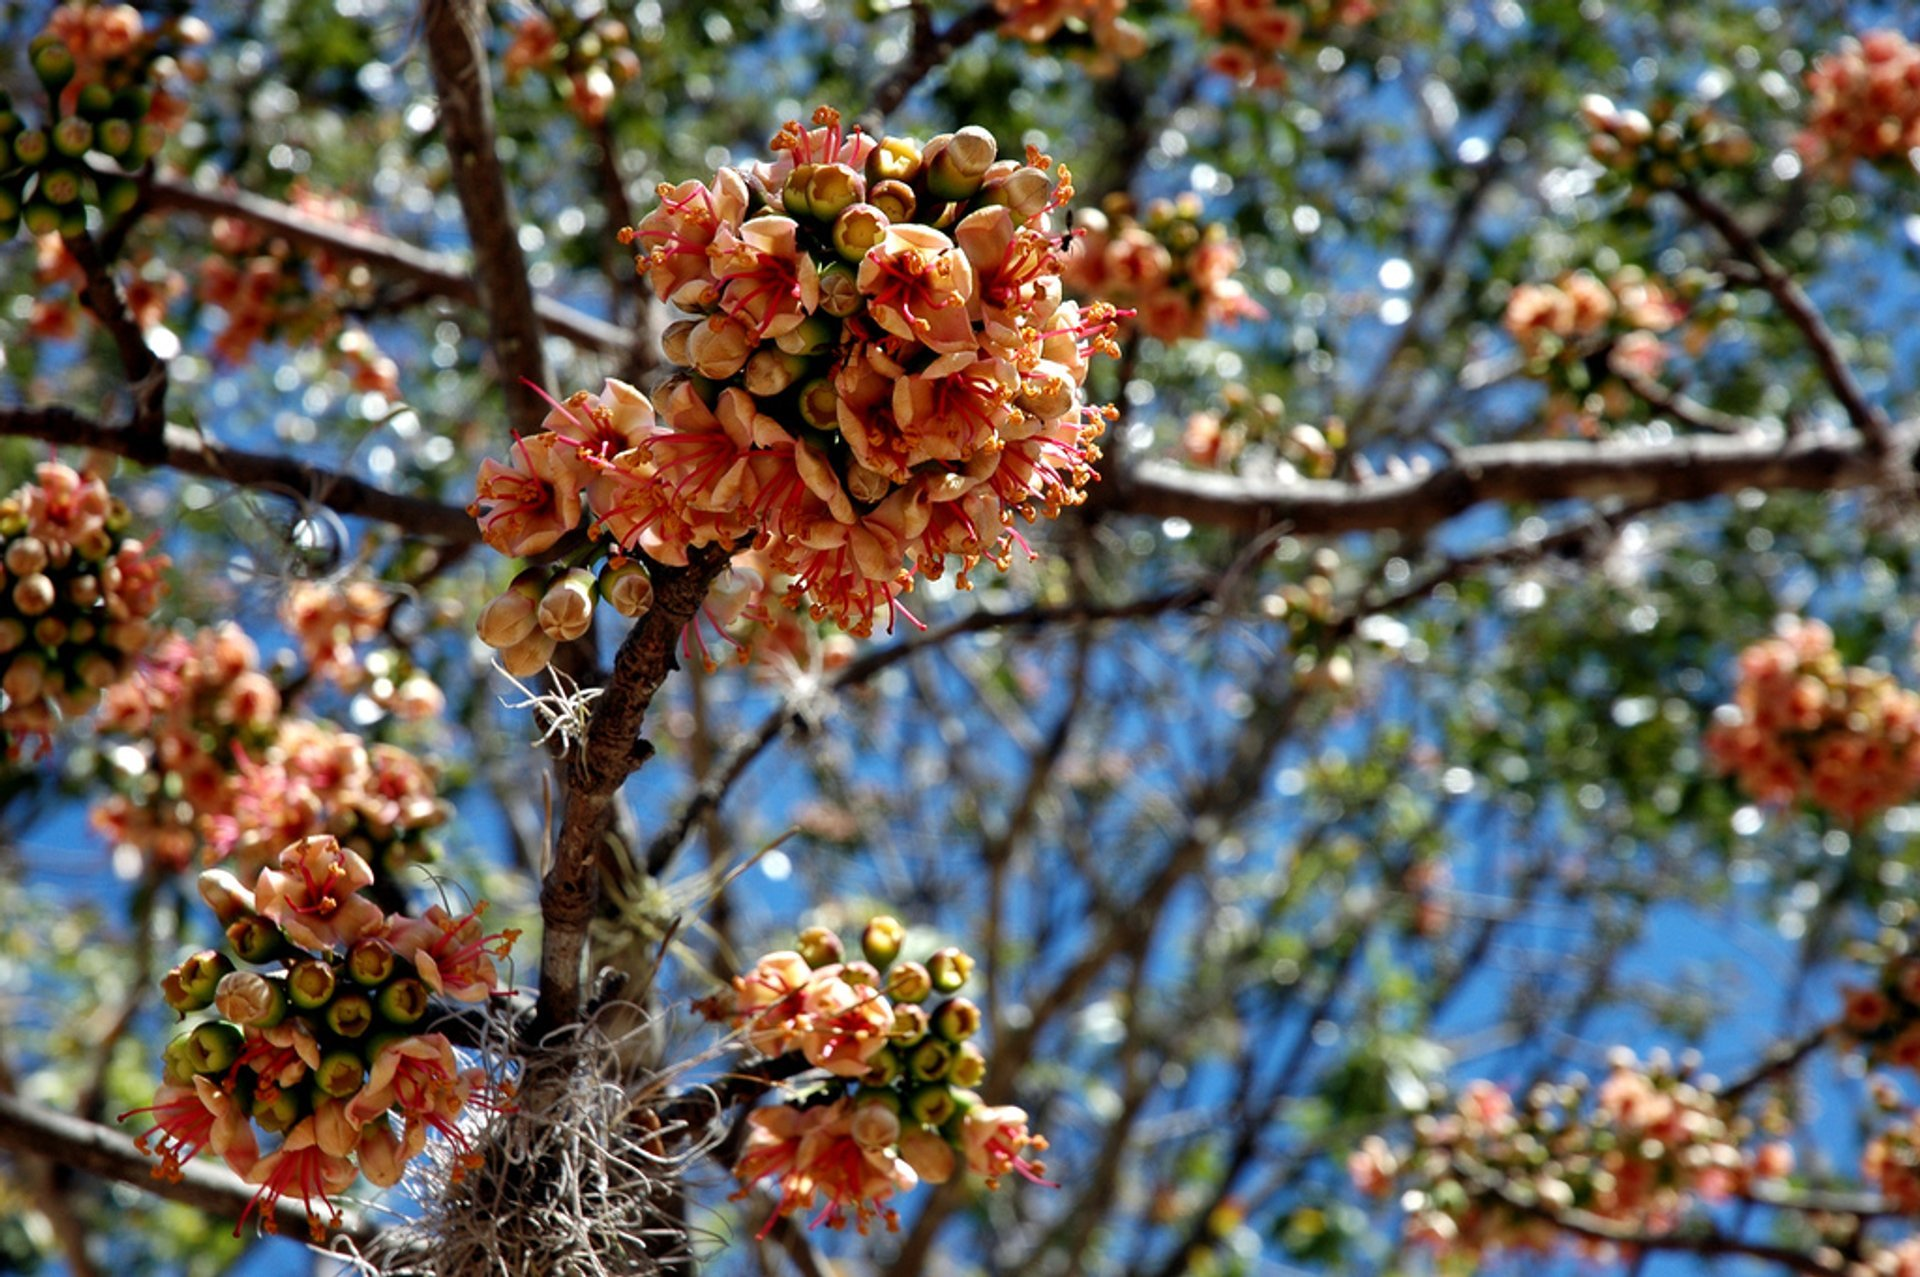 Ceiba Trees in Bloom in Guatemala - Best Season 2020